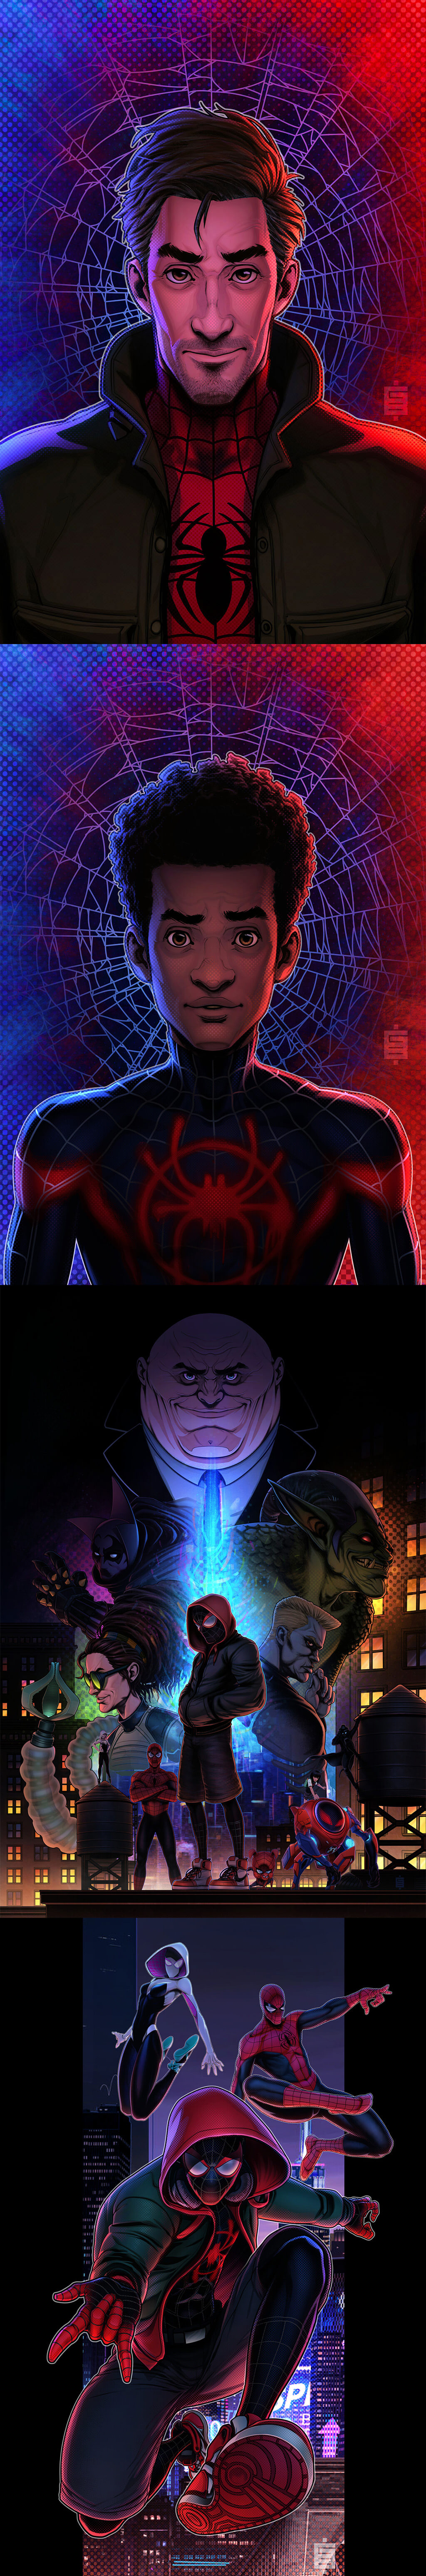 Spider-Man Fan Art by Bulat Gazizov